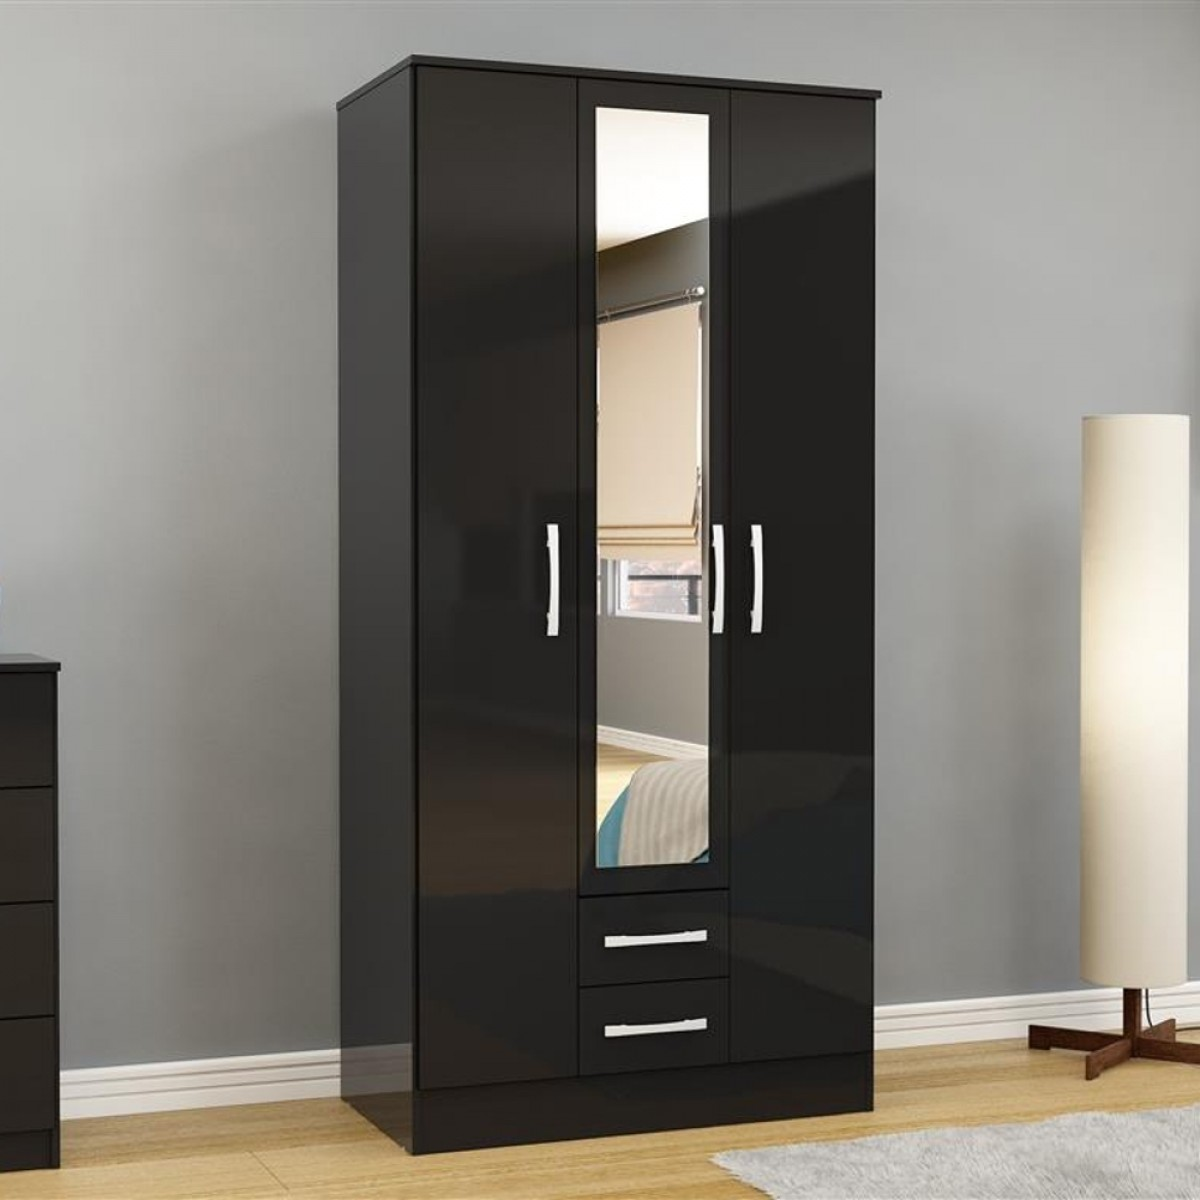 Lynx 3 Door Combination Mirrored Wardrobe Black